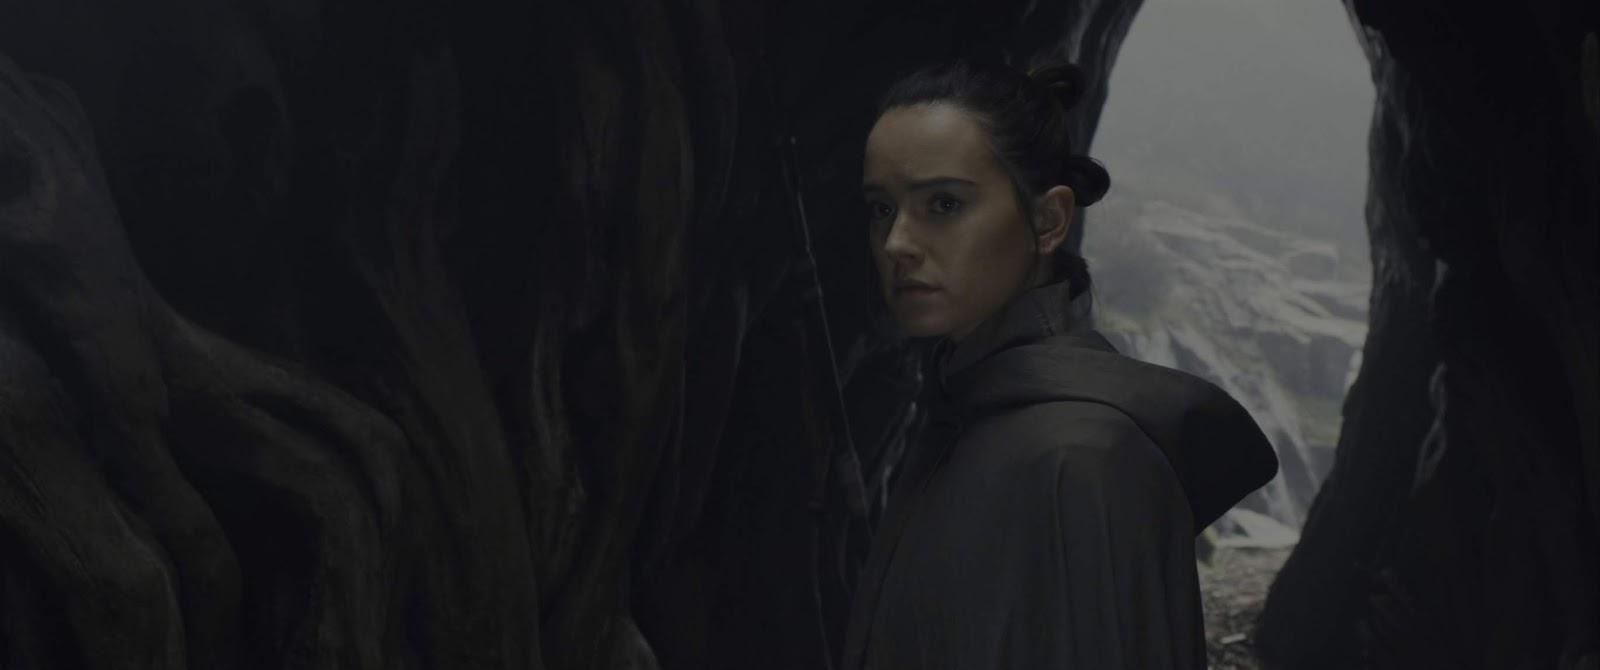 Star+Wars+Episodio+VIII+Los+%C3%9Altimos+Jedi+%282017%29+4K+WEB-DL+HDR+Latino+-+Ingles+-+Descargatepelis.com.mkv_snapshot_00.24.35_%5B2020.01.08_10.17.04%5D.jpg (1600×670)